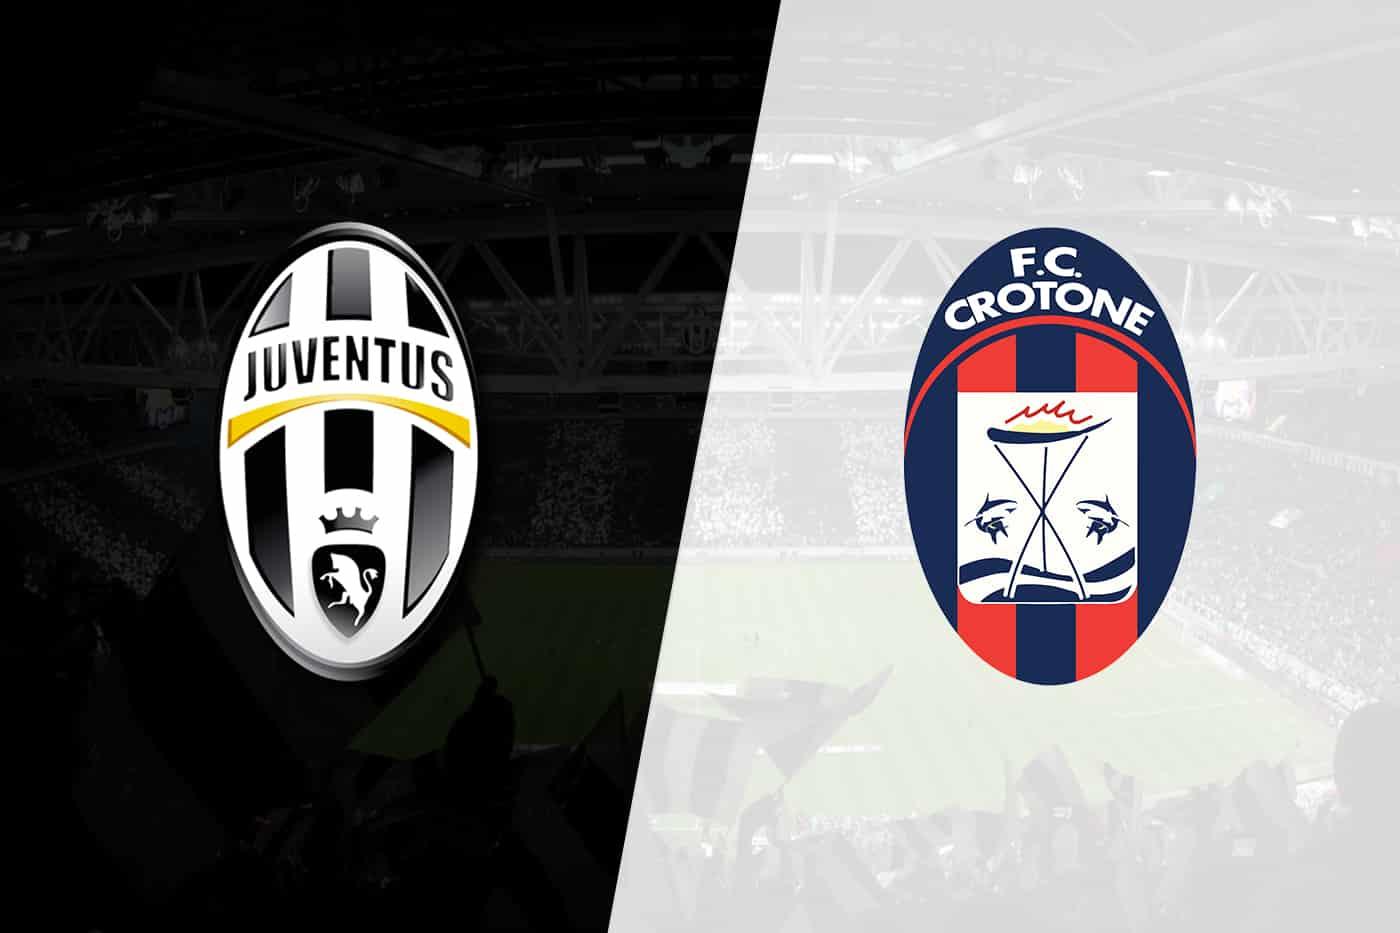 Juventus Crotone Streaming gratis diretta live tv dove vedere partita Hesgoal